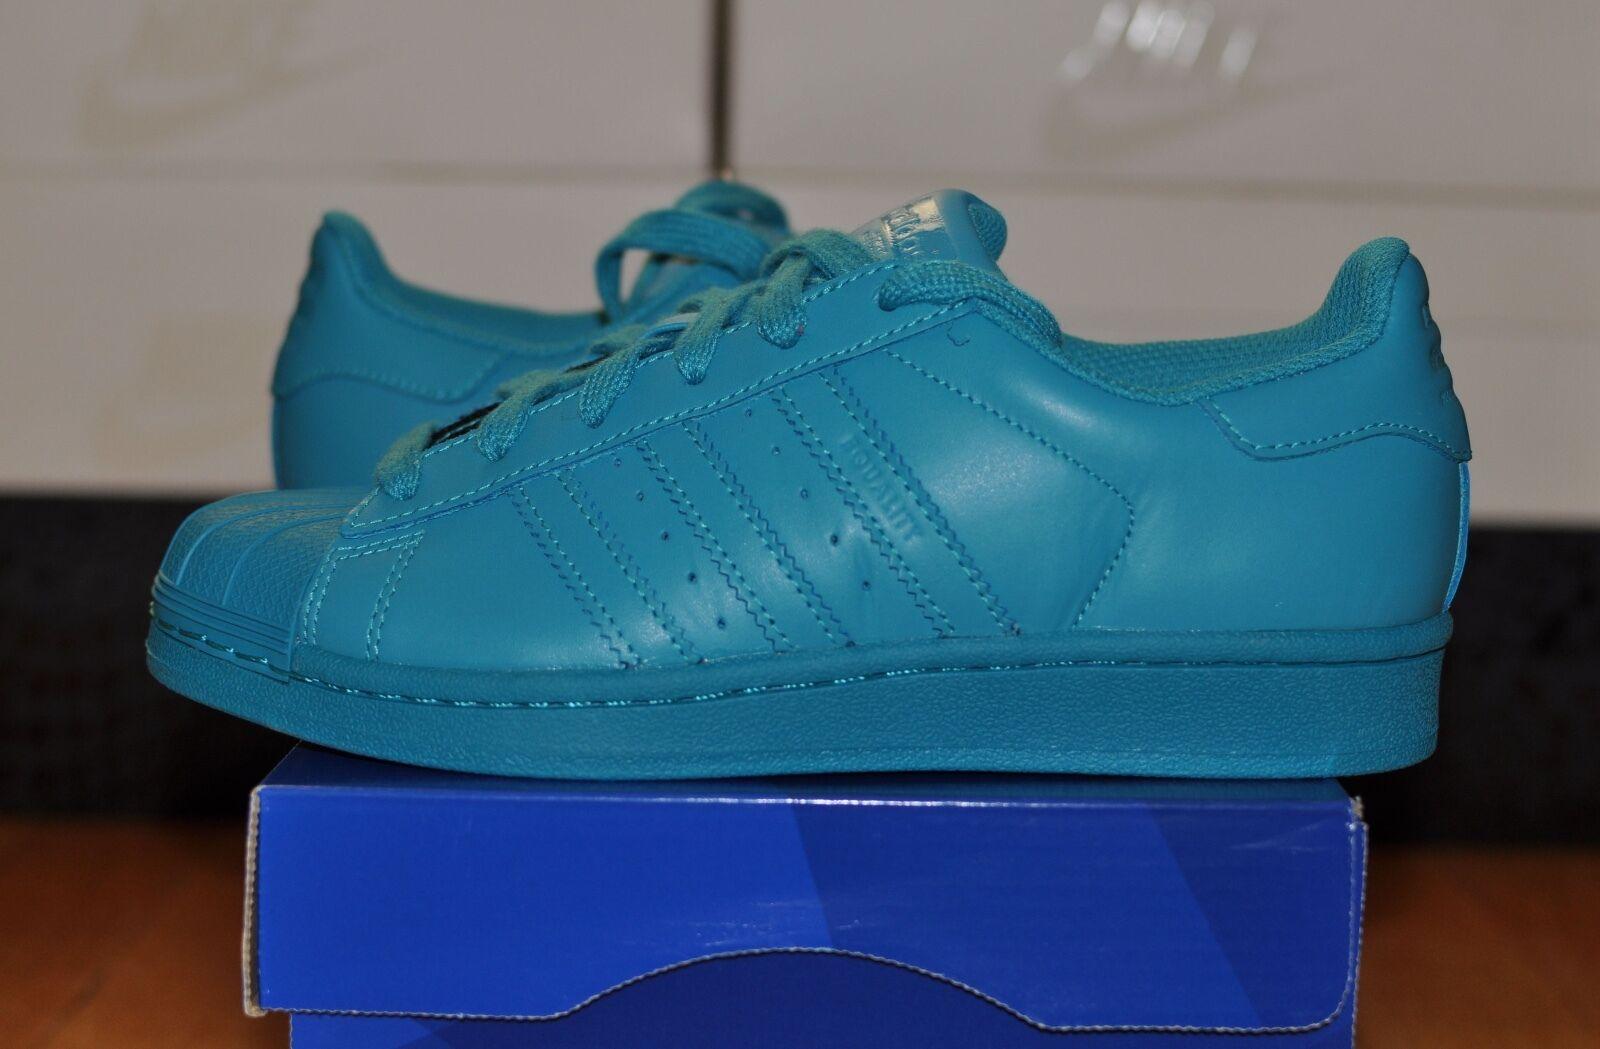 Adidas Pharrell Williams Superstar Supercolor Lab Green S41835 RUN DMC 4.5 9